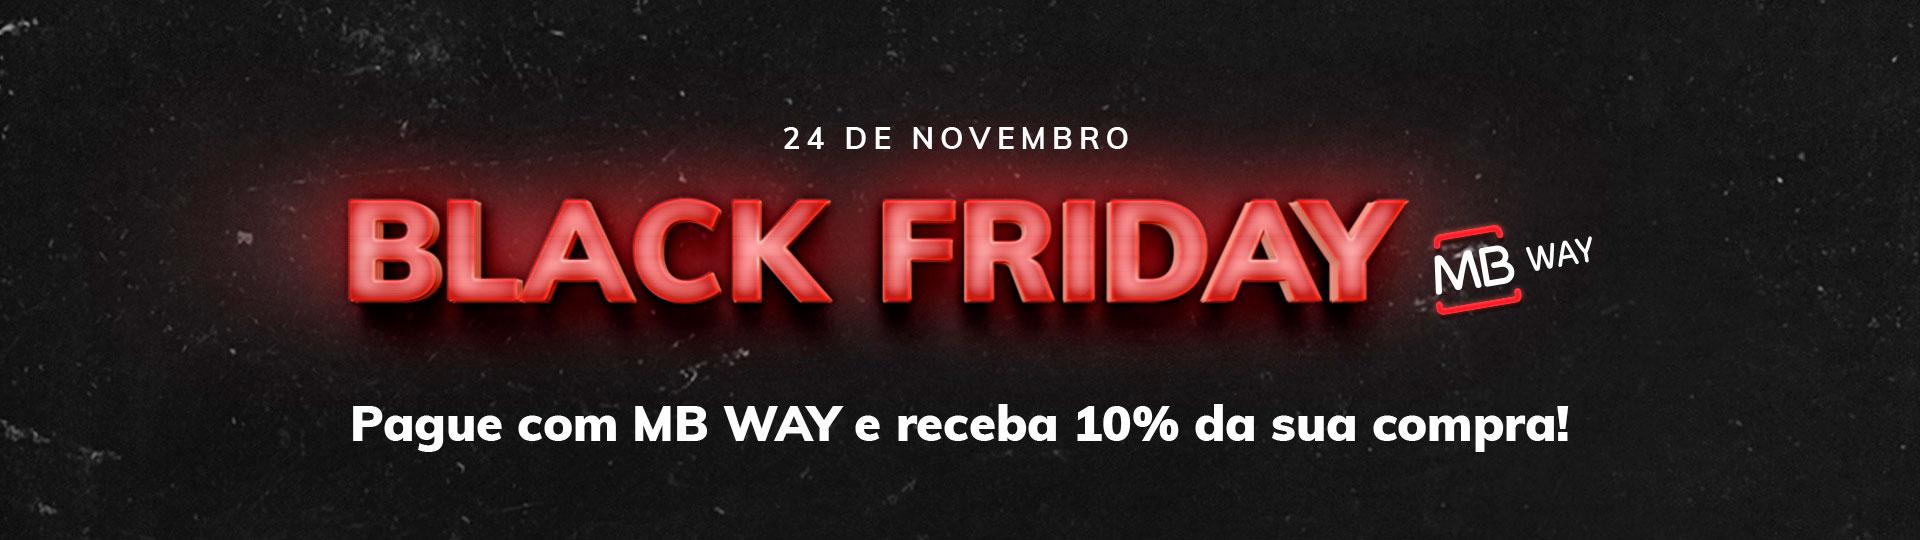 Black Friday - MB WAY